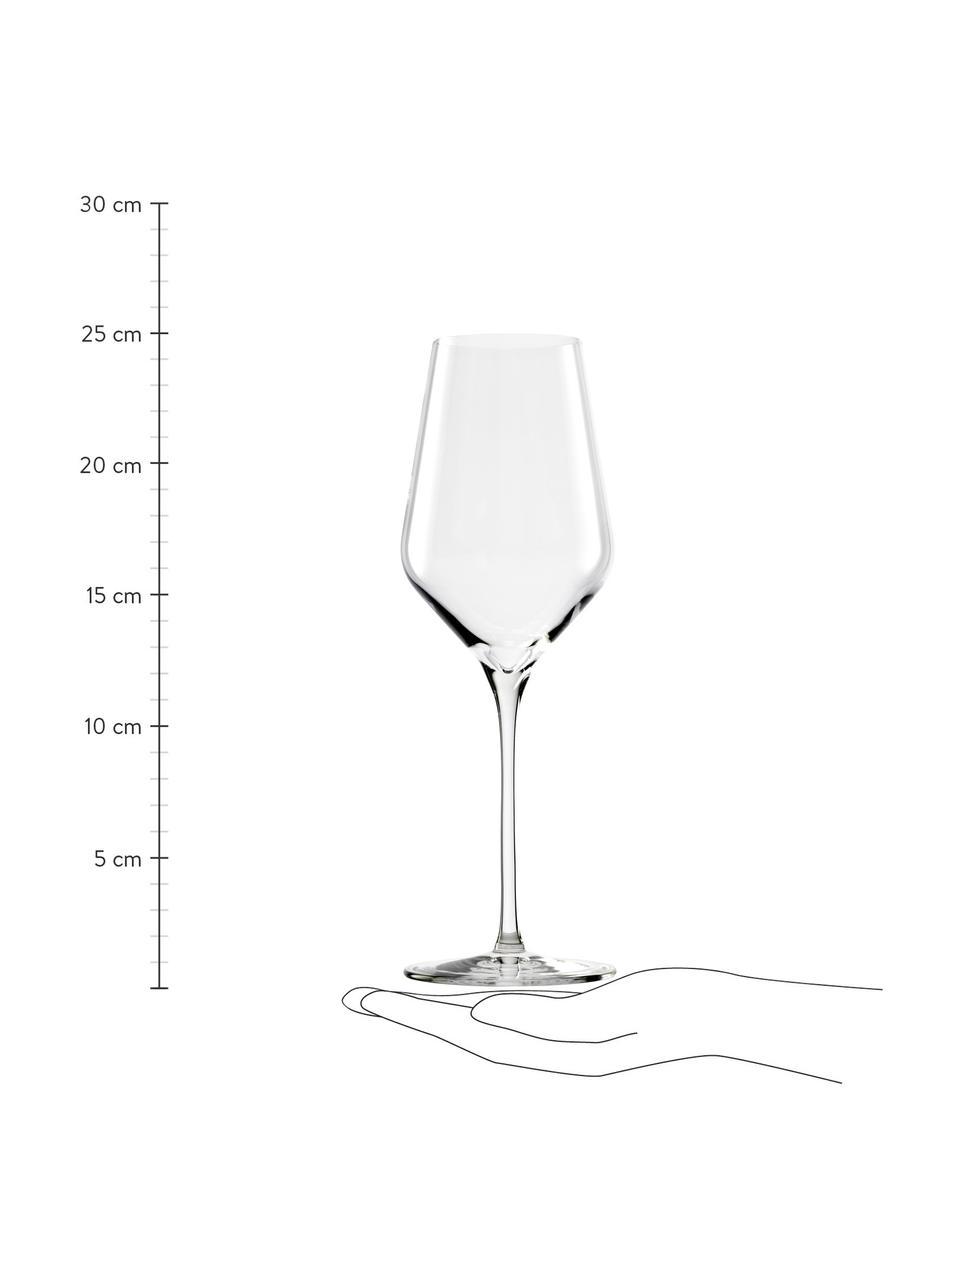 Bicchiere vino bianco in cristallo Quatrophil 6 pz, Cristallo, Trasparente, Ø 8 x Alt. 25 cm